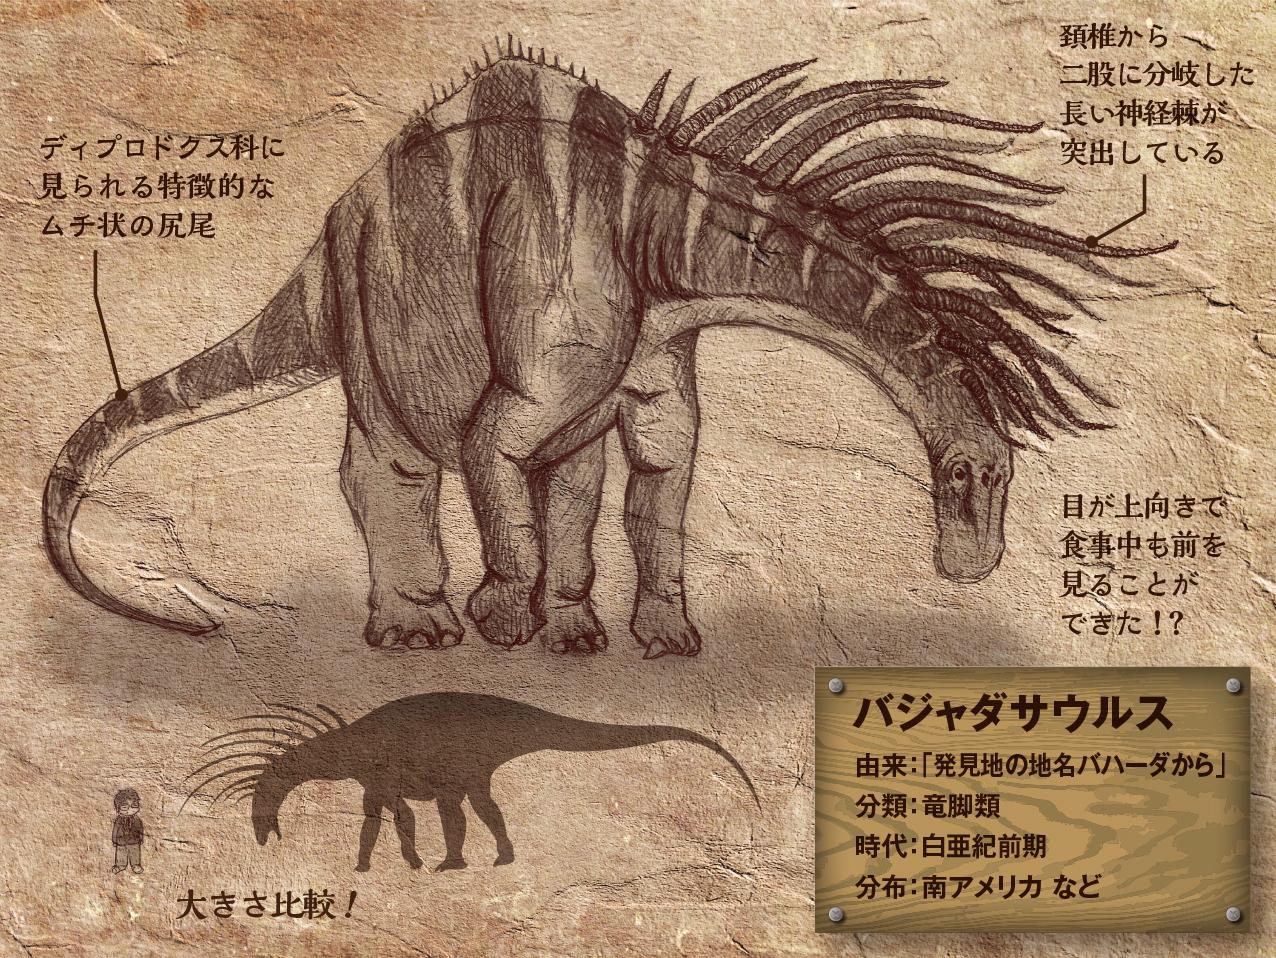 Bajadasaurus.jpg